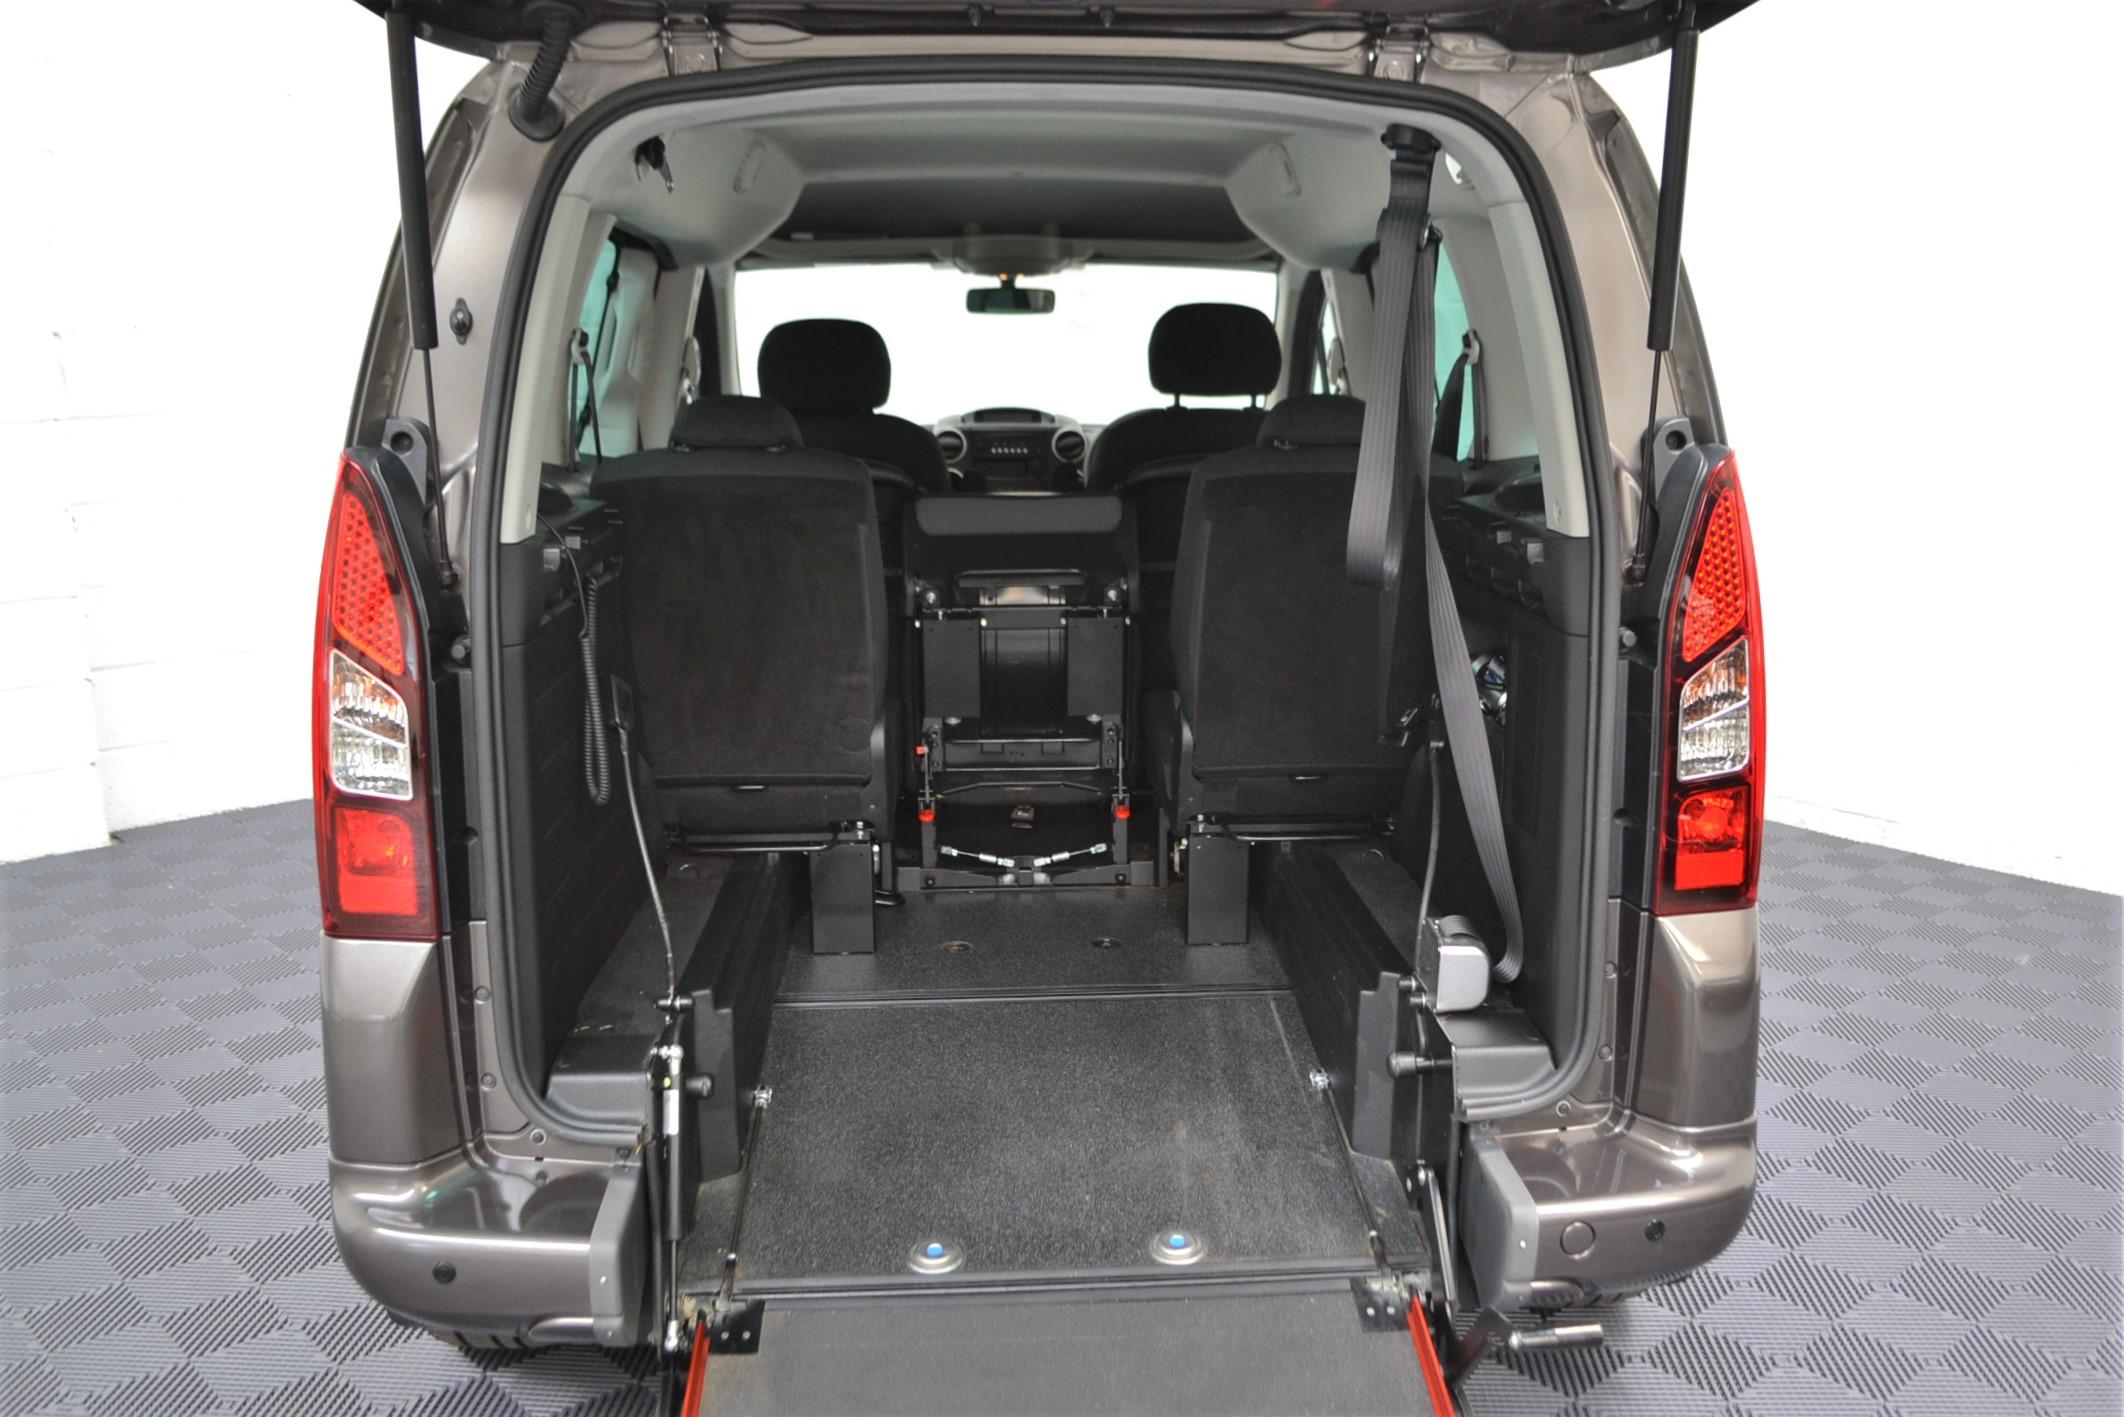 WAV Cars For Sale Bristol Wheelchair Accessible Vehicles Used For Sale Somerset Devon Dorset Bath Peugeot Partner WO16 HNH 3